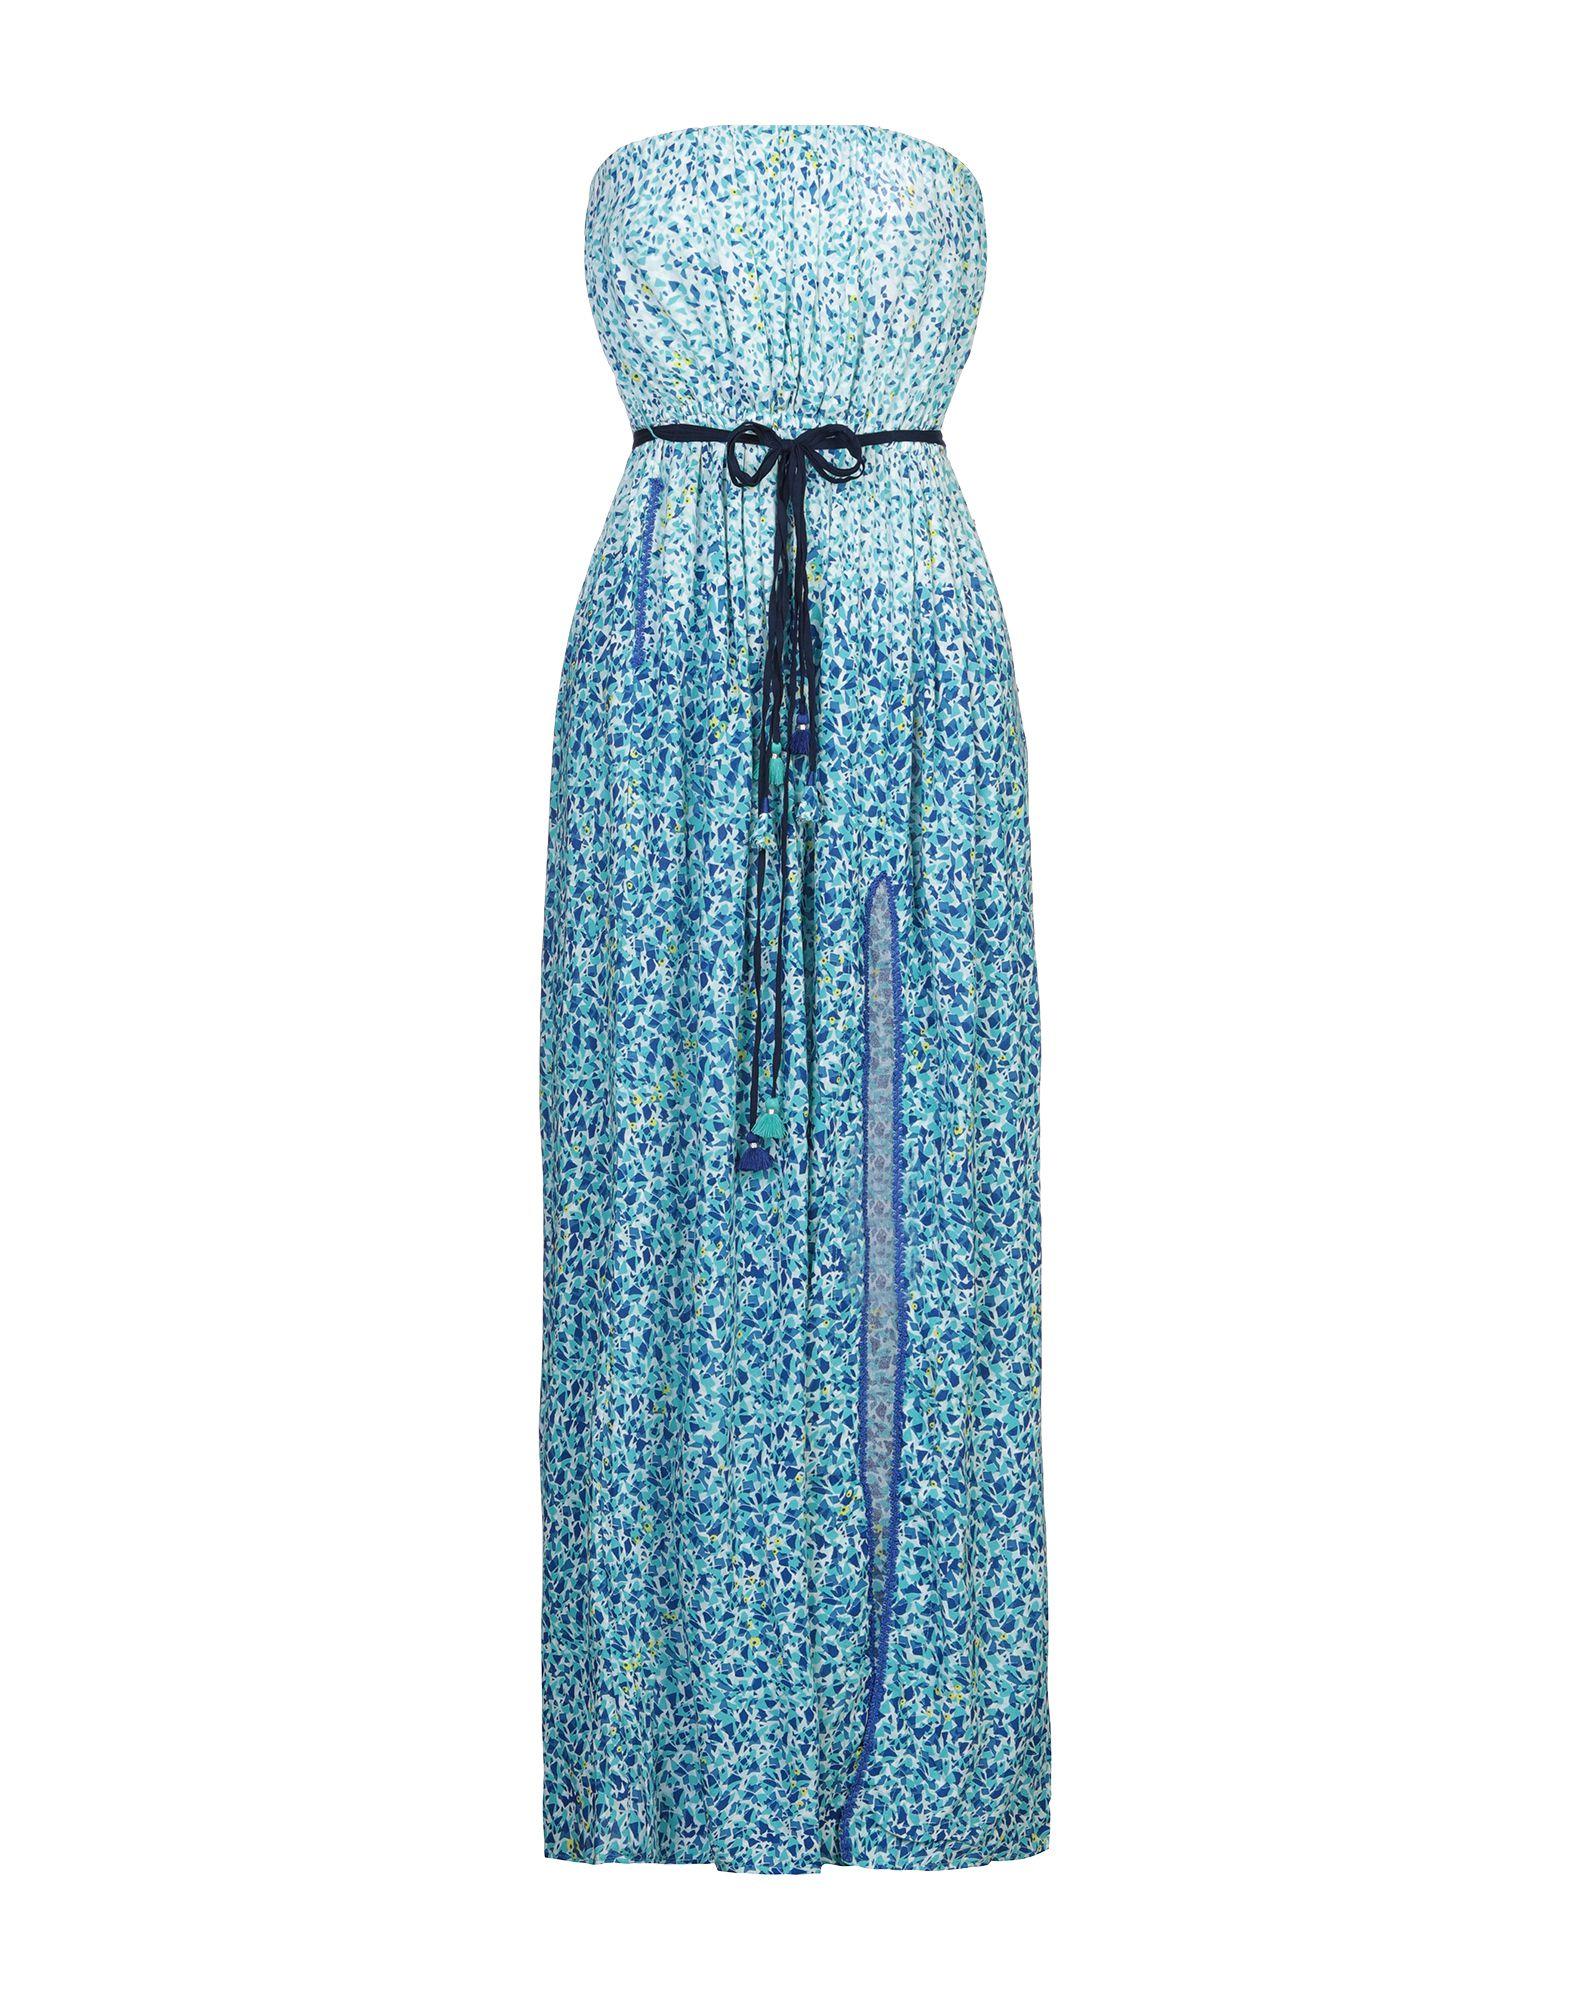 POUPETTE ST BARTH Длинное платье